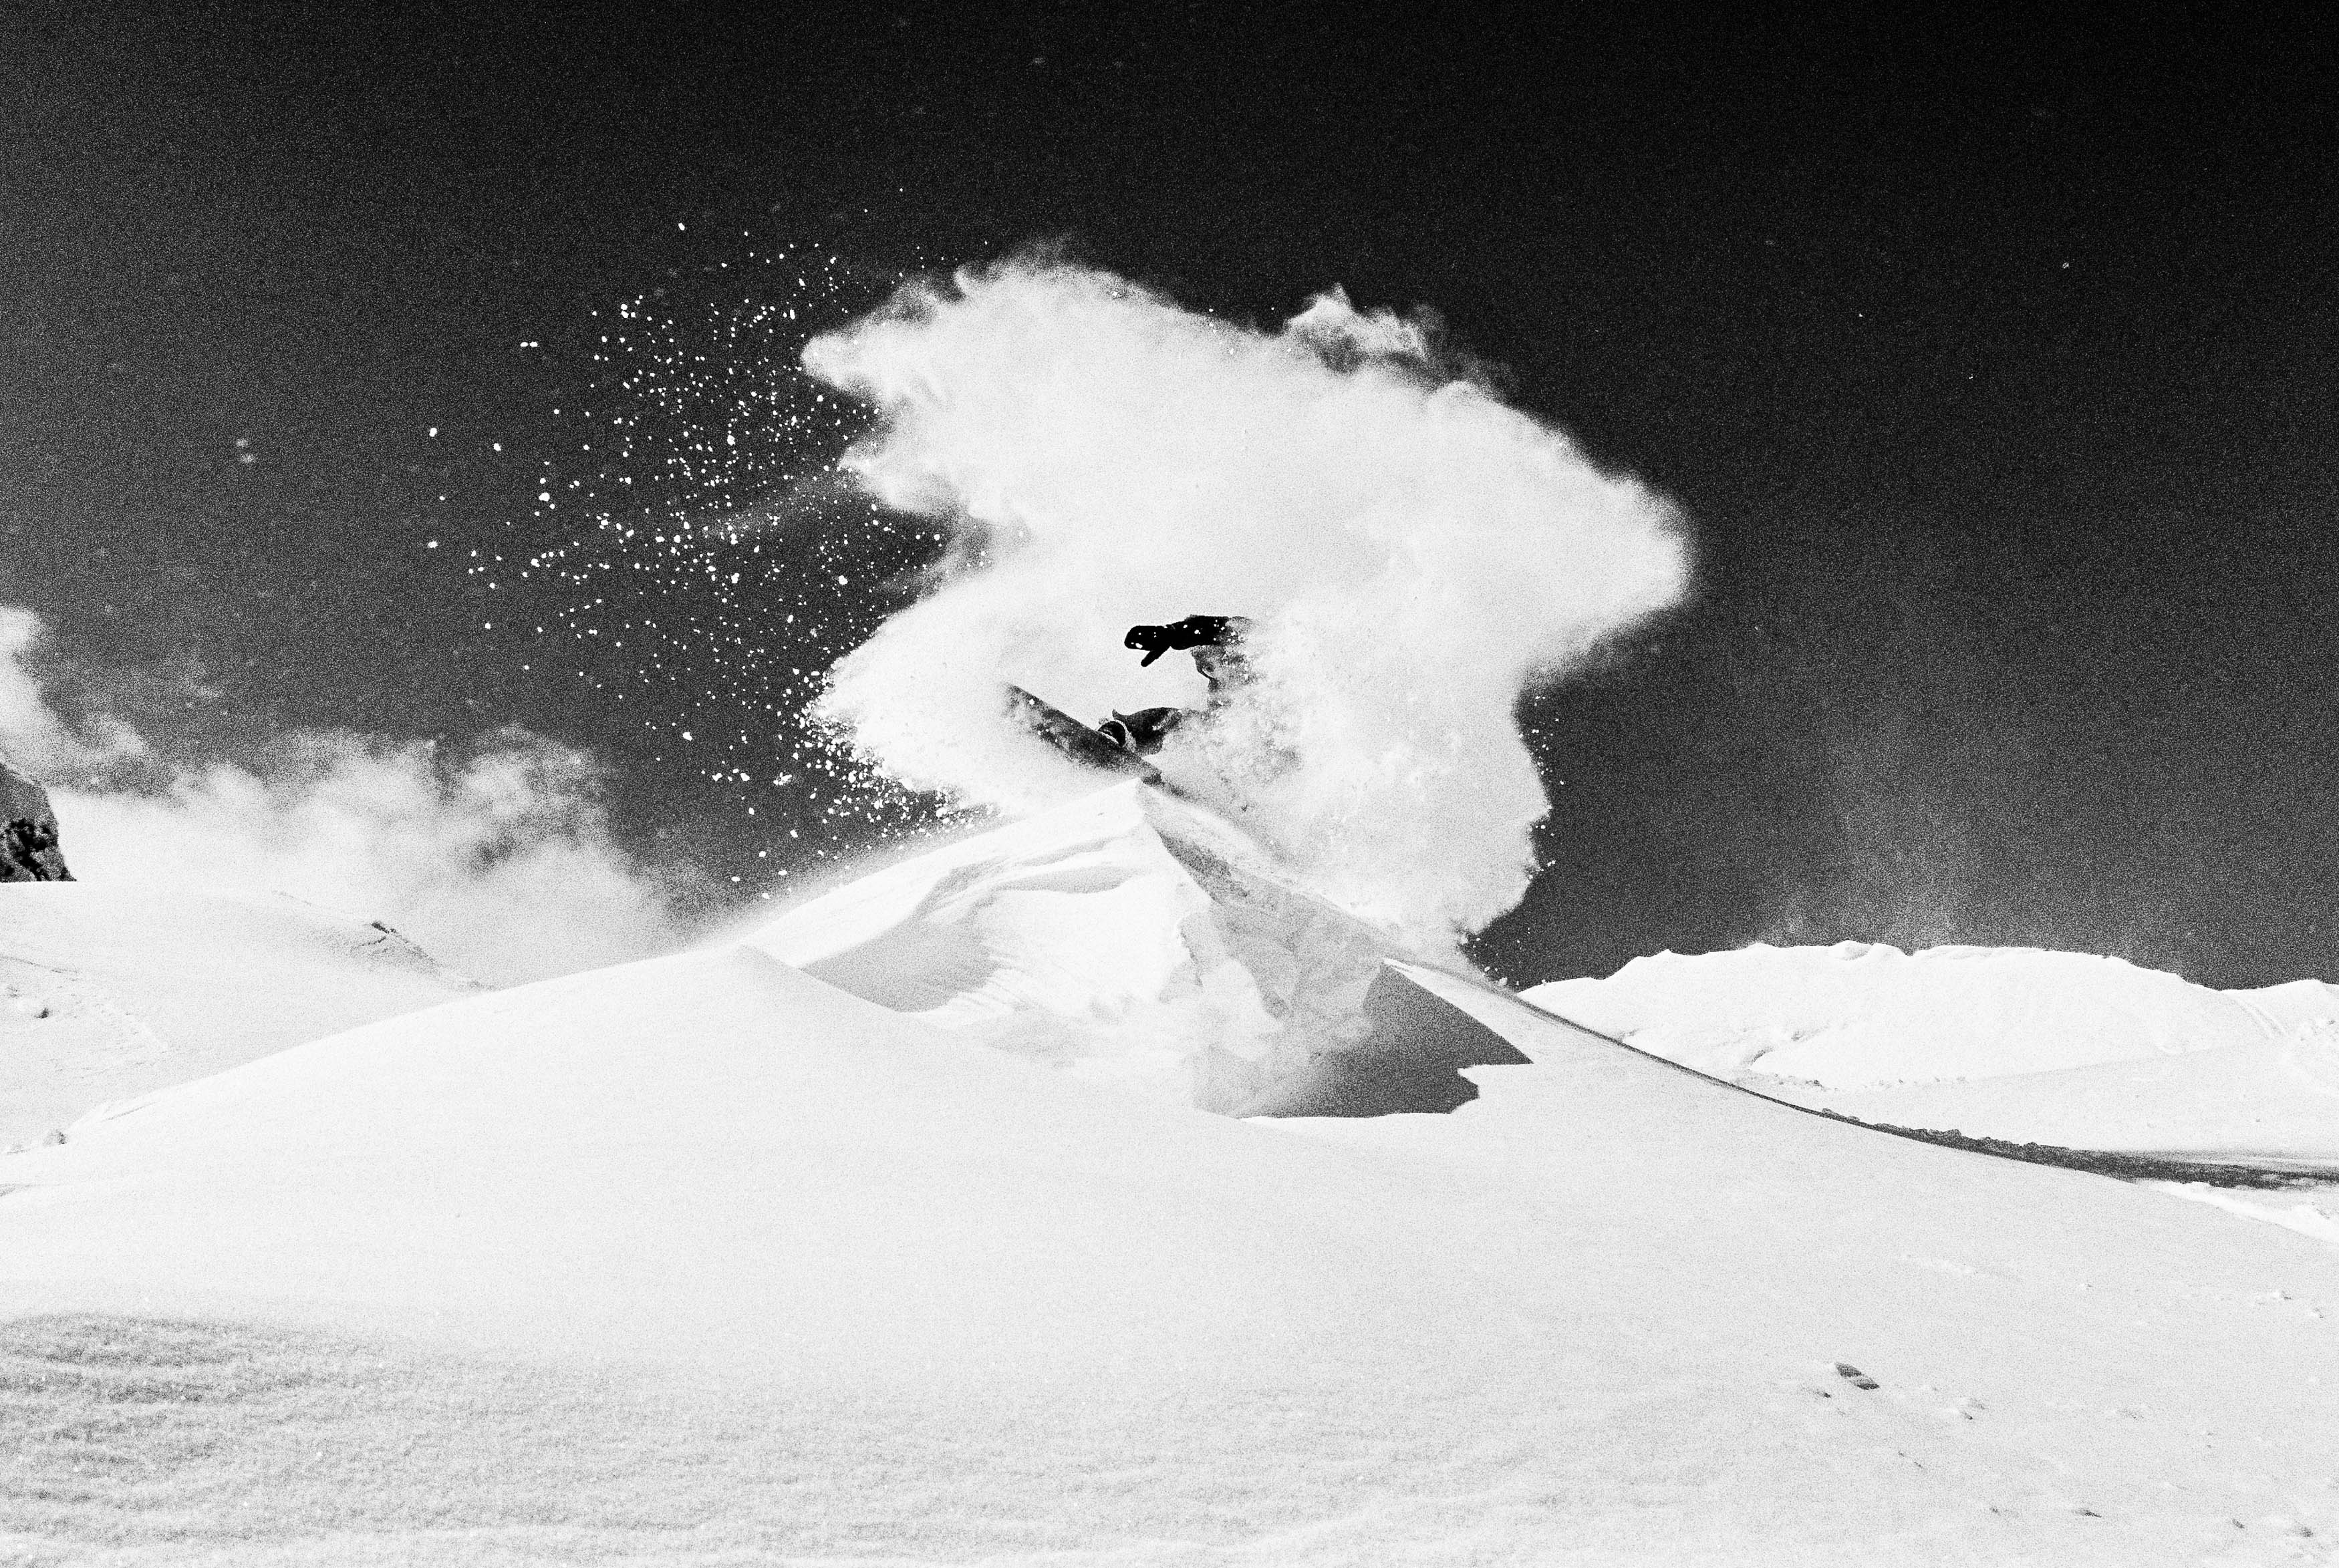 NARRATIV SNOWBOARDING